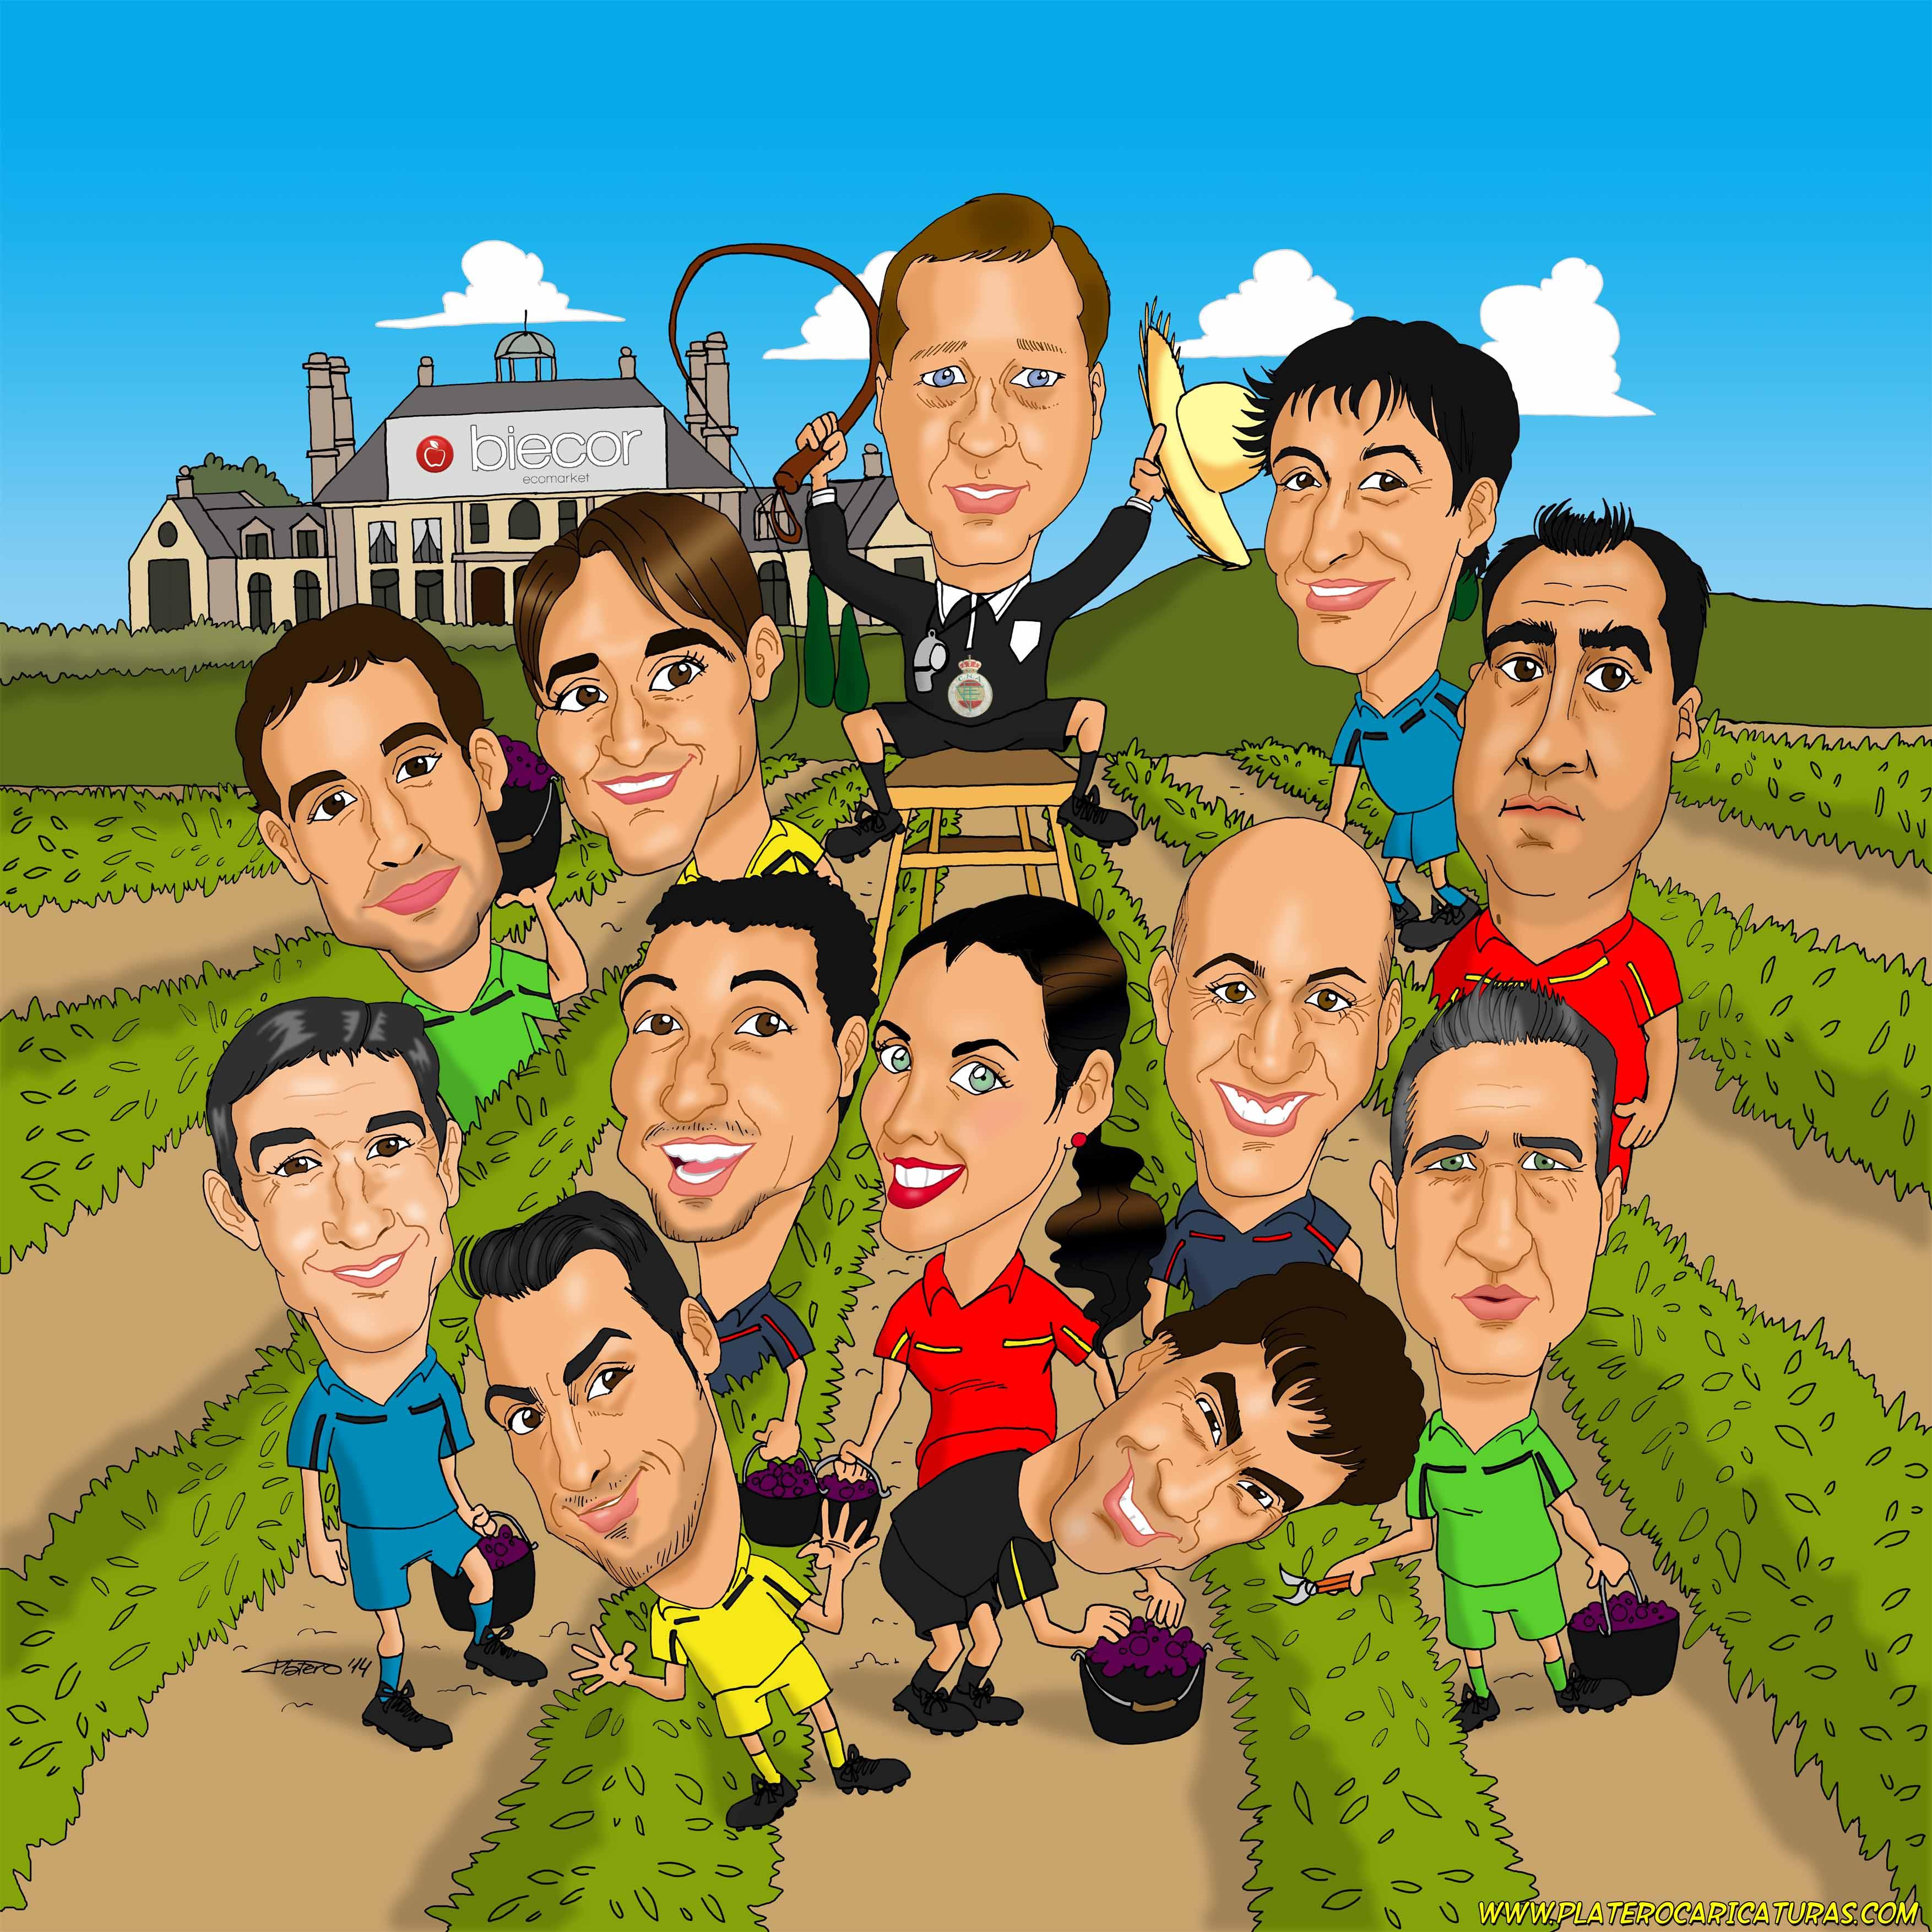 caricaturas_a_color_por_encargo_personalizadas_grupo_de_árbitros_platerocaricatu